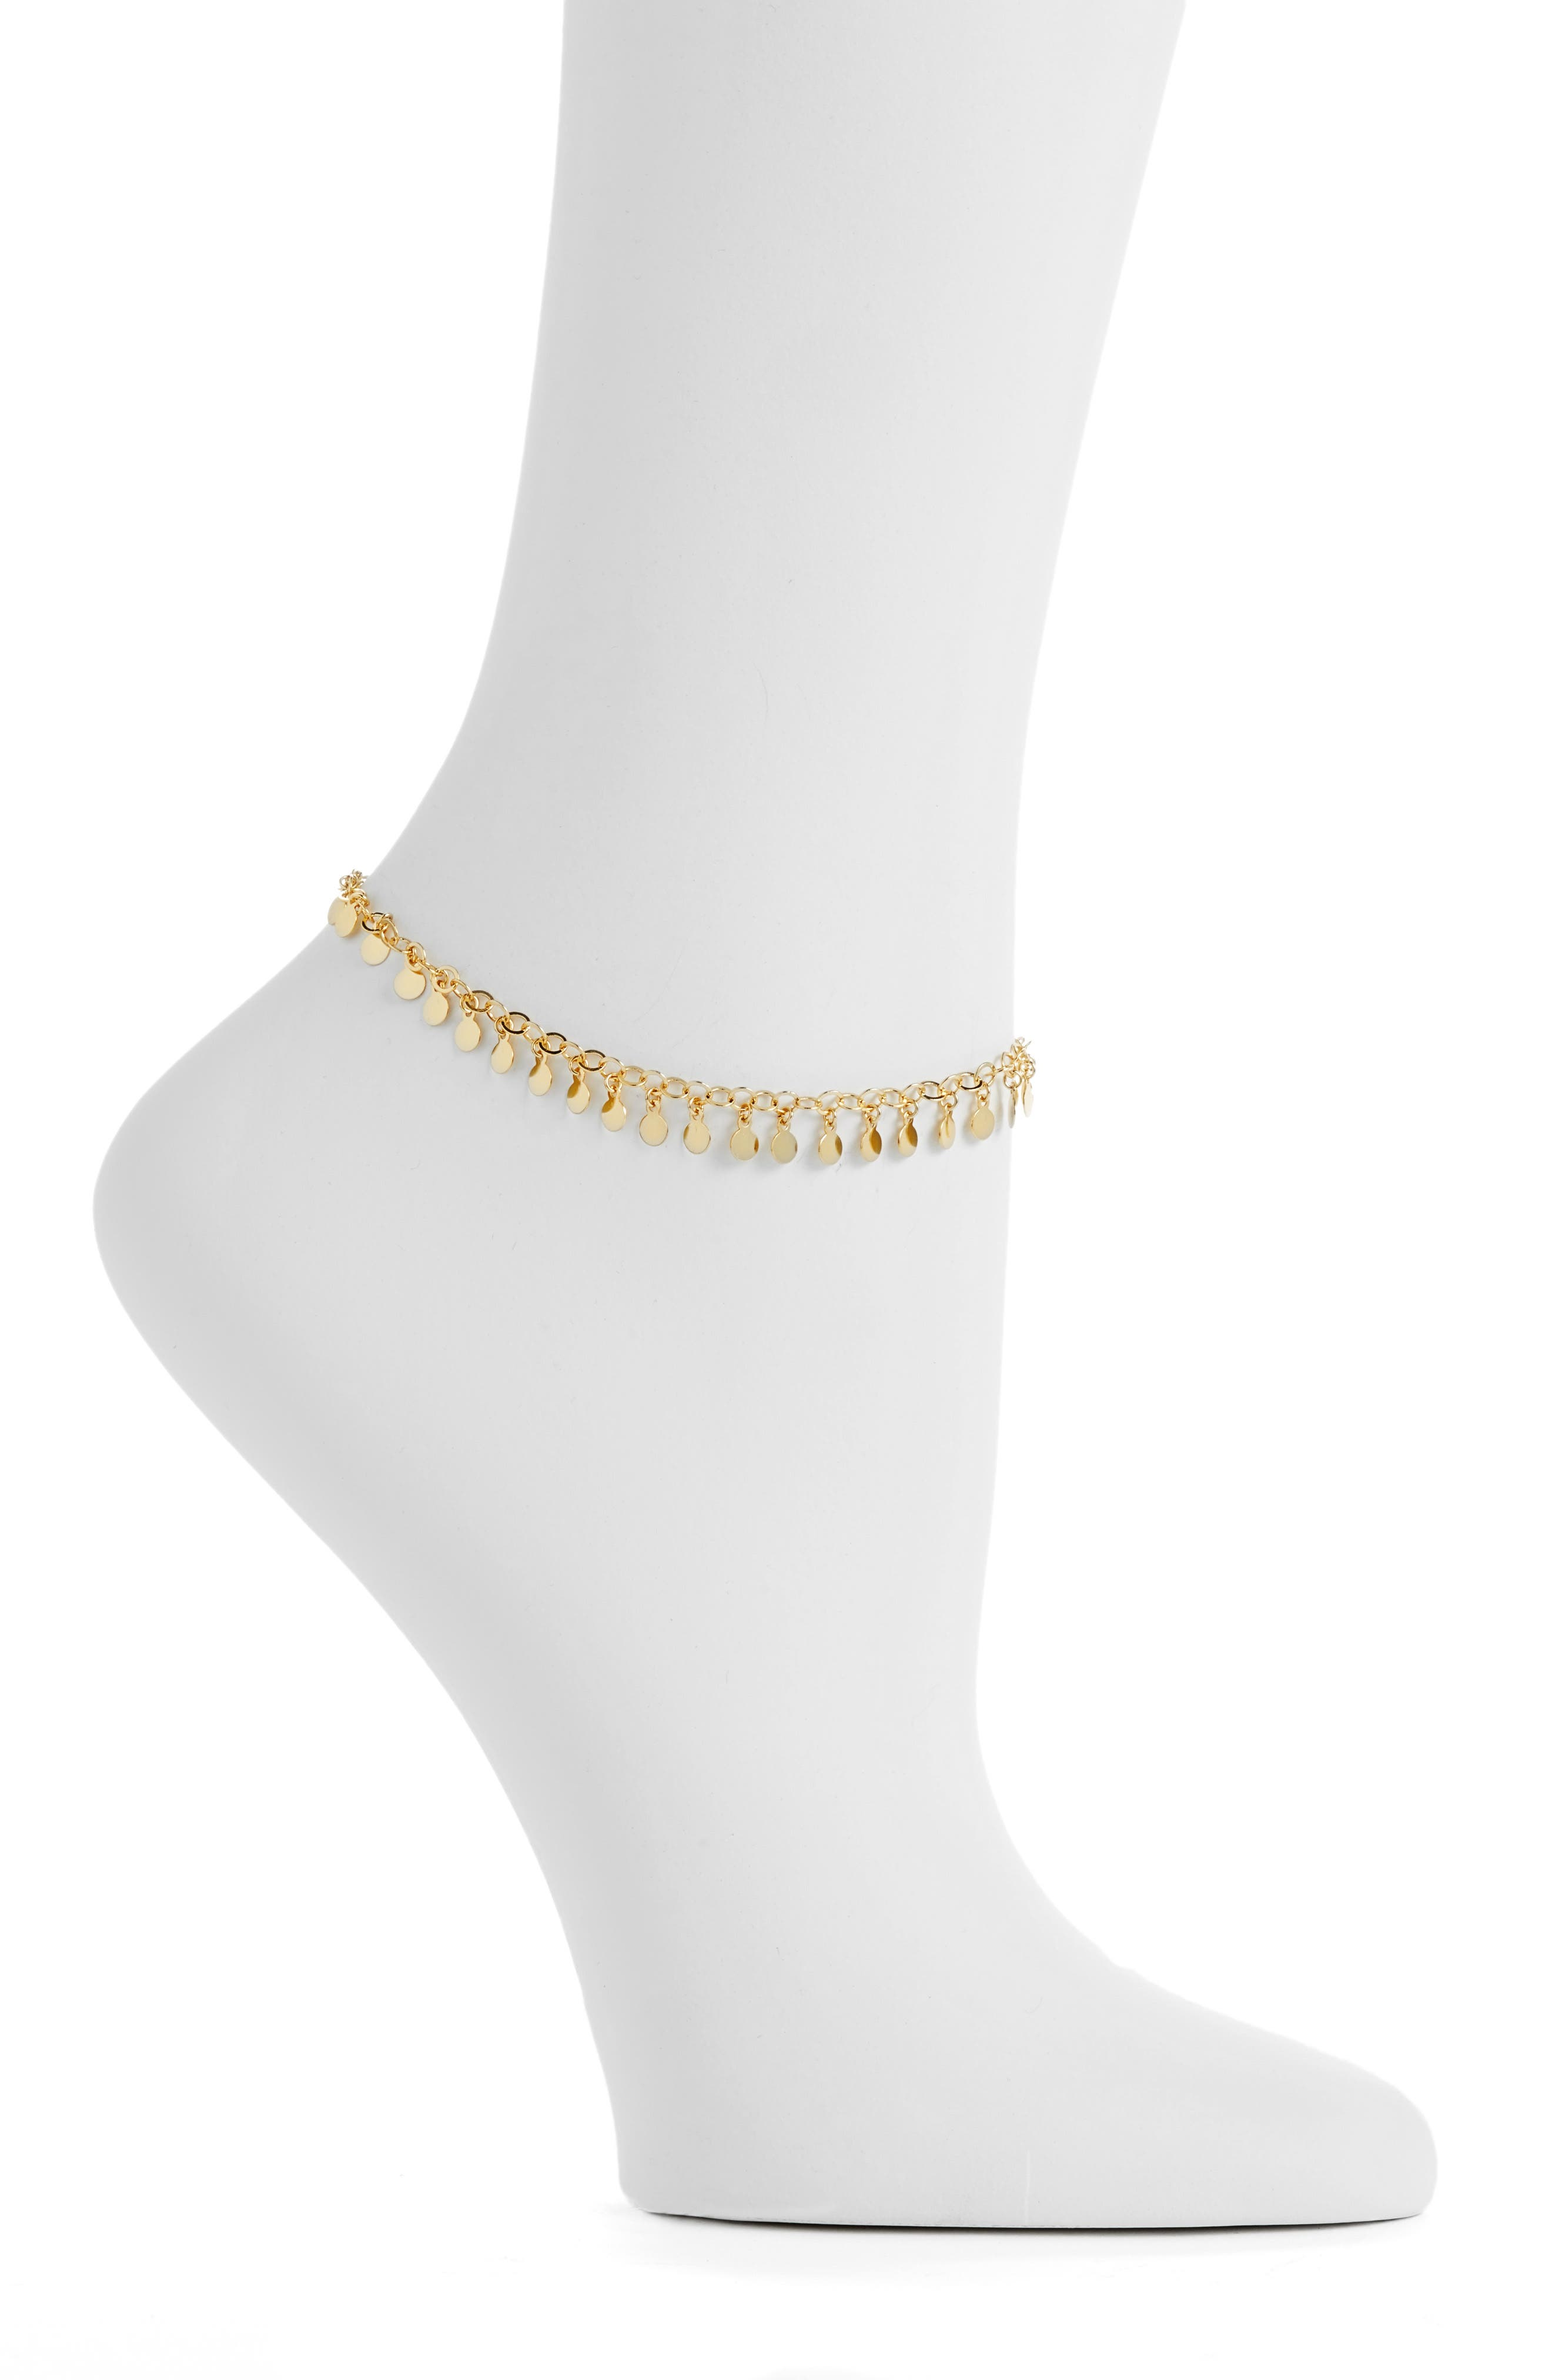 Carmen Chain Anklet,                             Main thumbnail 1, color,                             GOLD